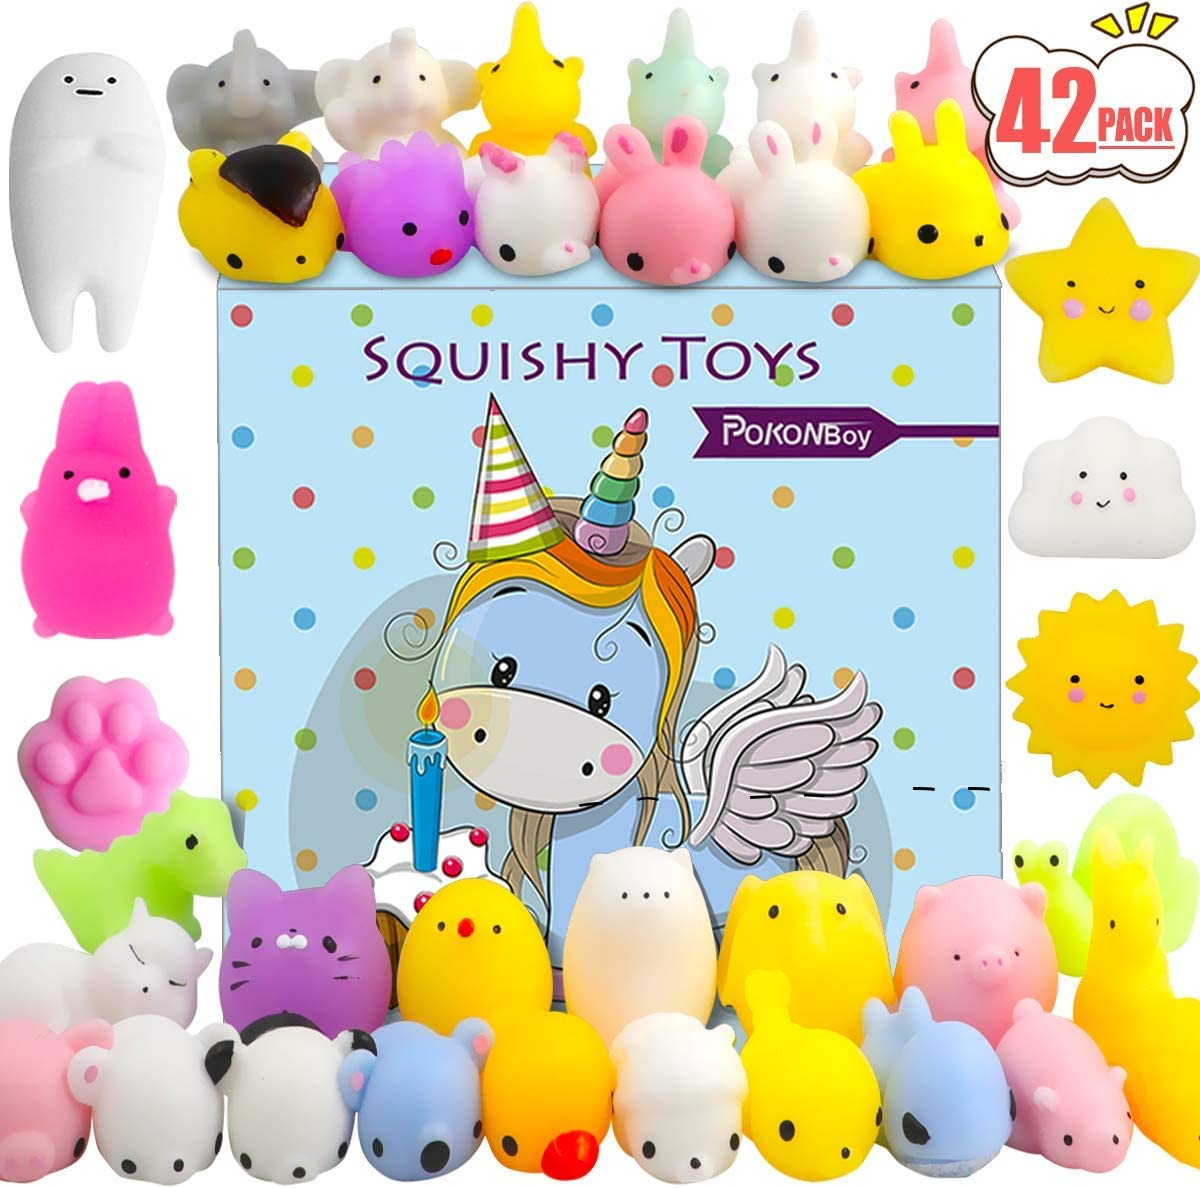 POKONBOY 42 Pcs Mini Mochi Squishies Toys, Mochi Squishy Toy Stress Reliever Toys Party Favors for Kids Boys Girls